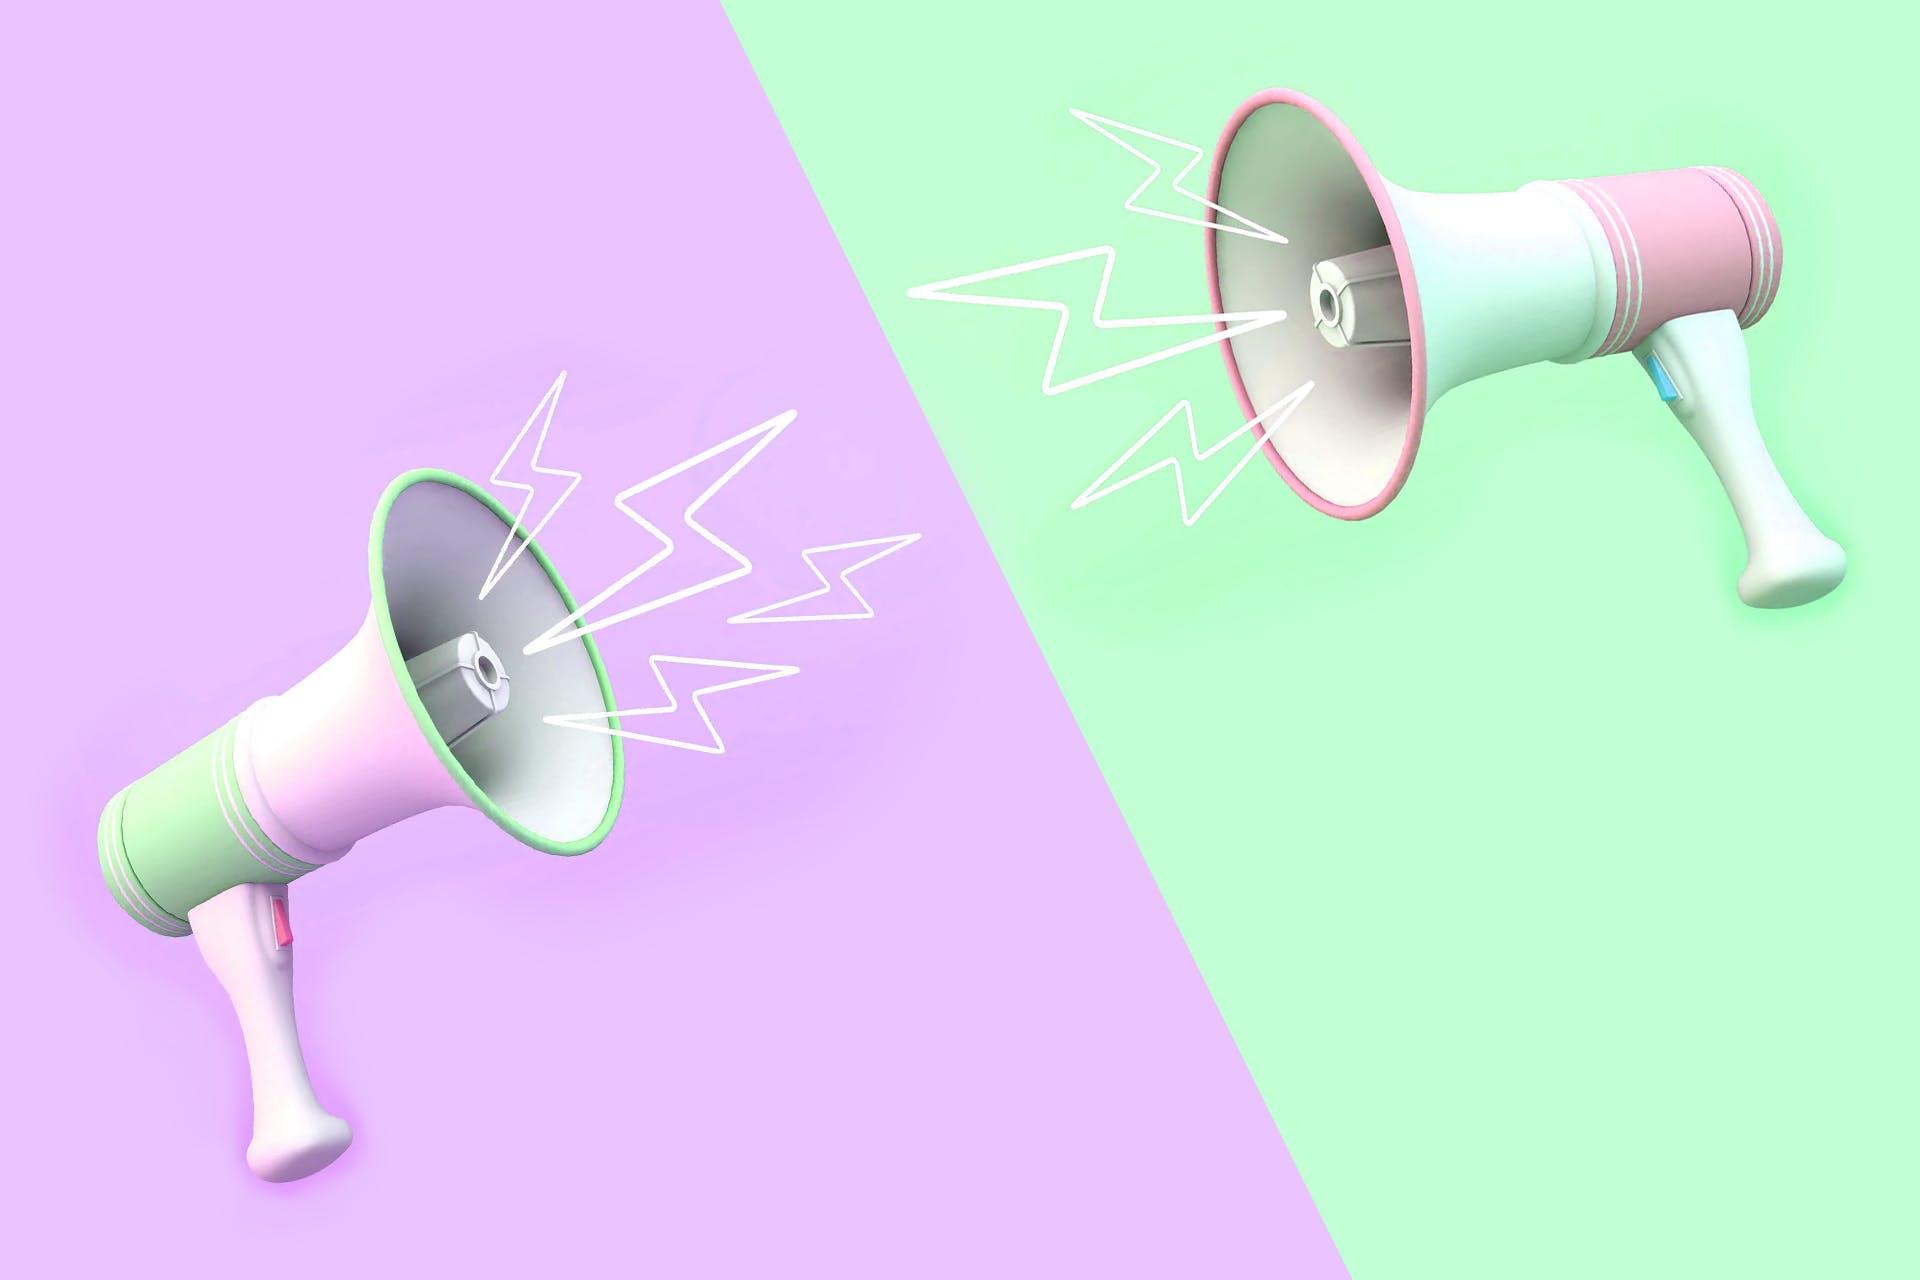 Two megaphones.